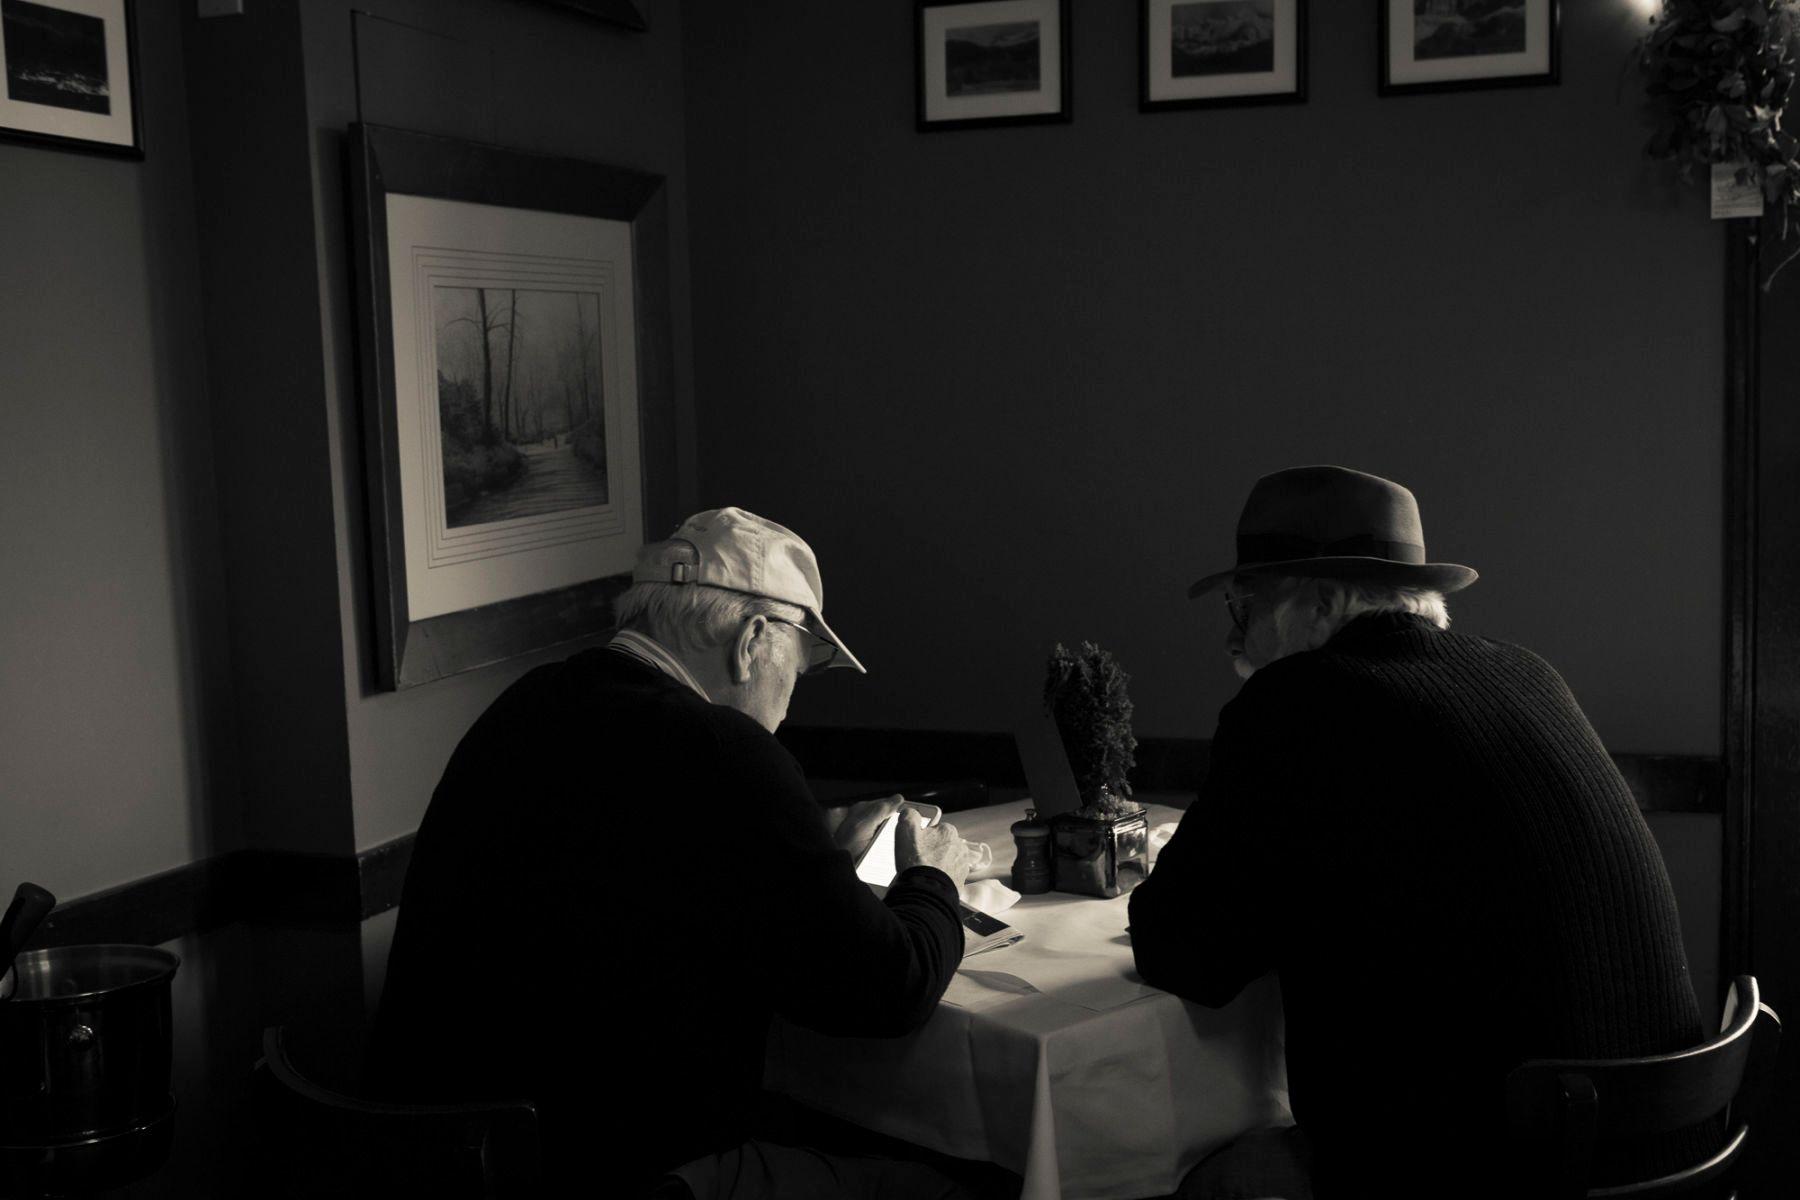 Balboa Cafe Conversations